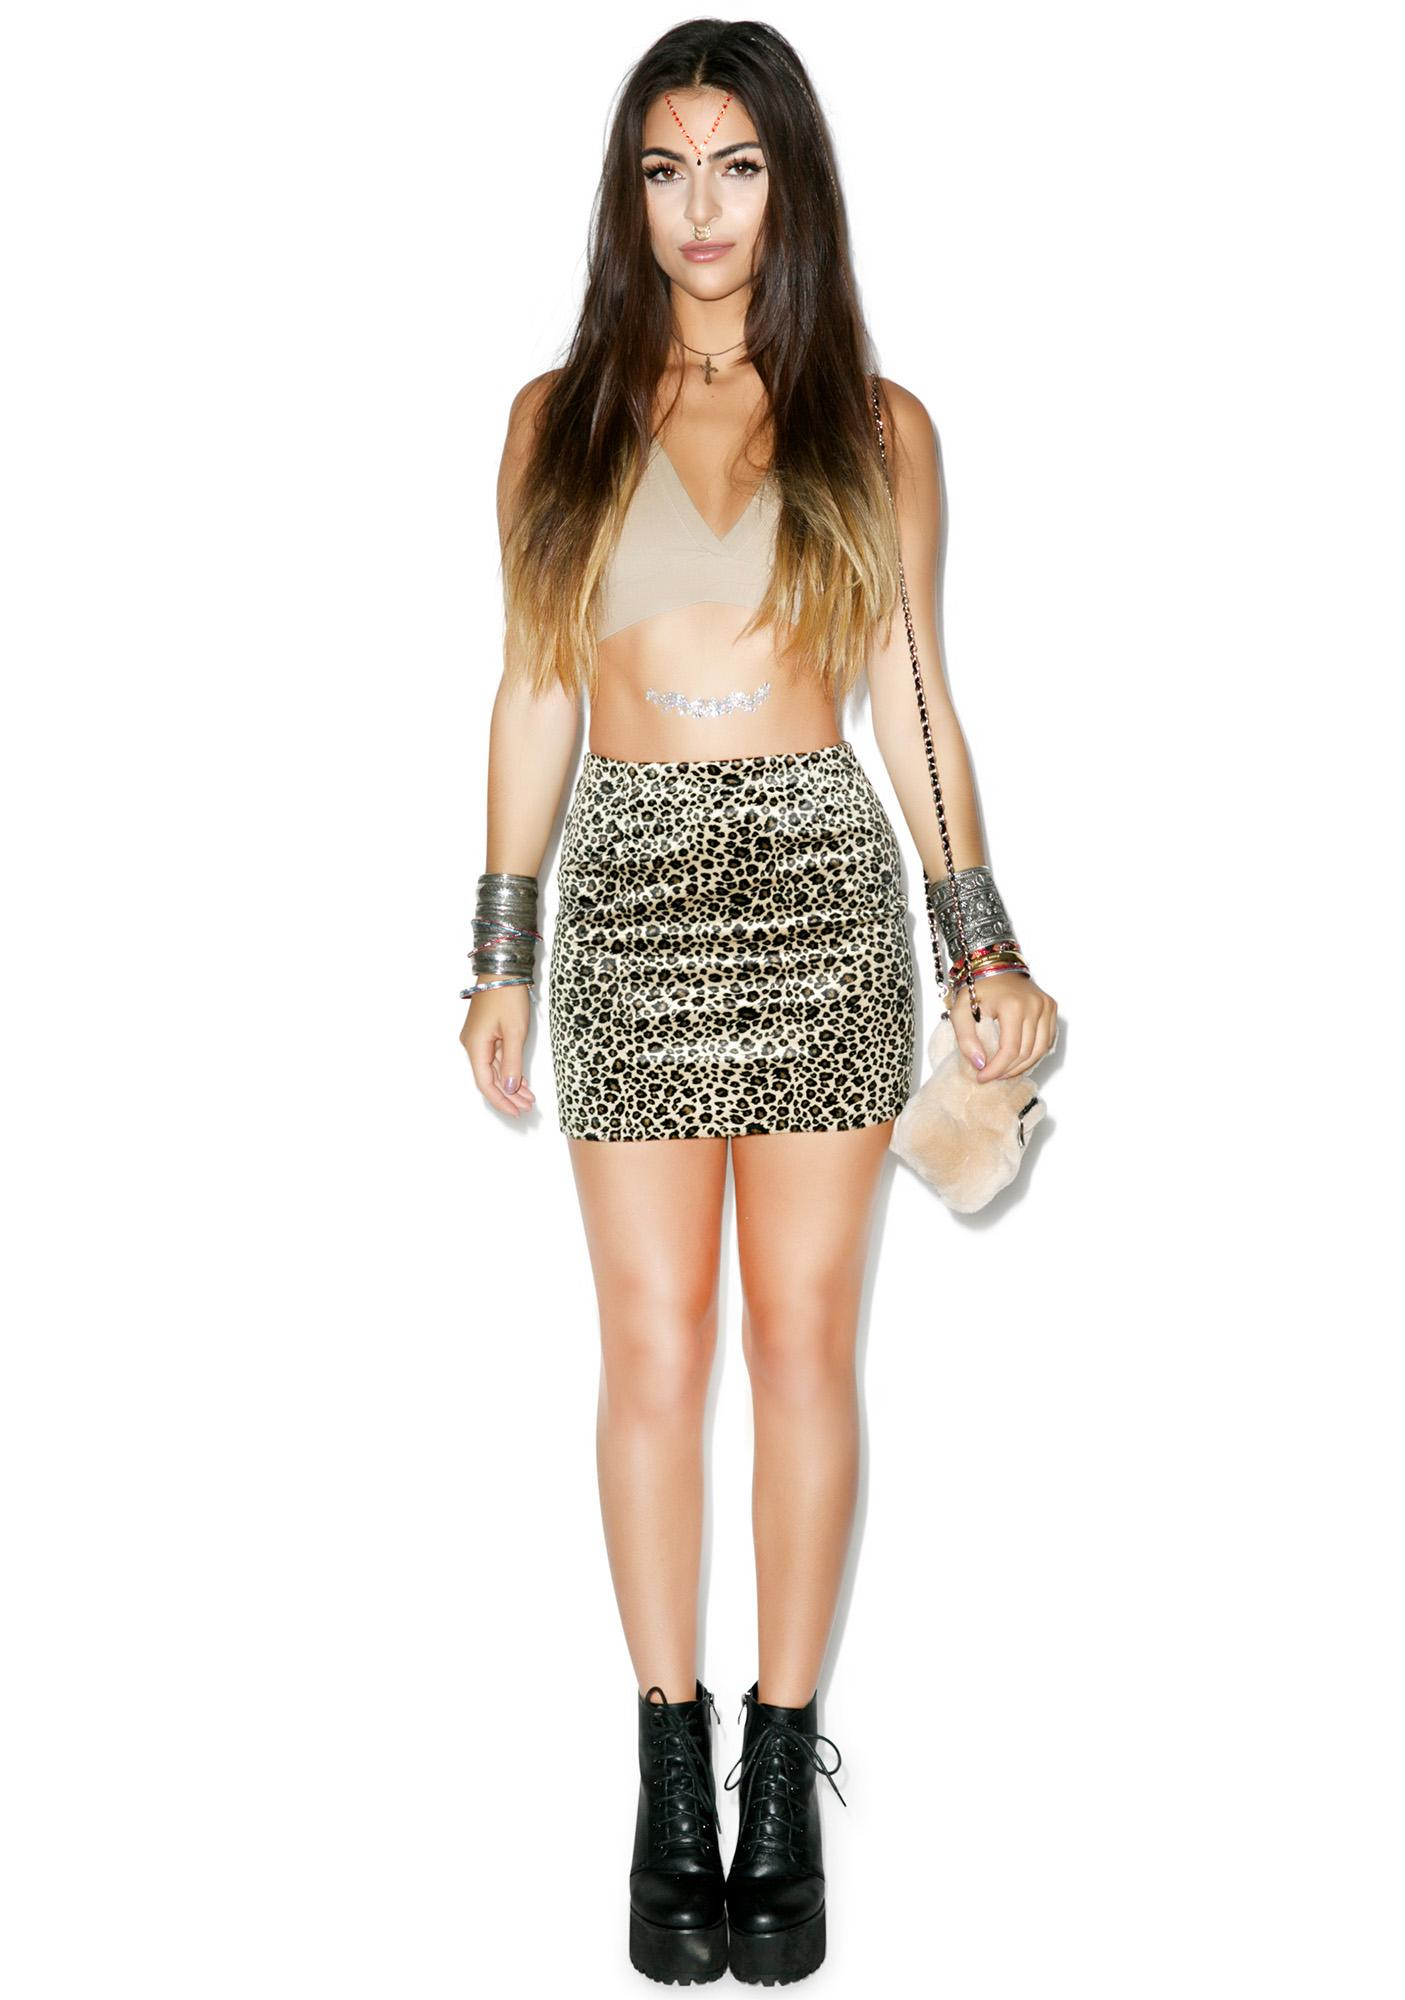 R U Faux Real Cheetah Skirt